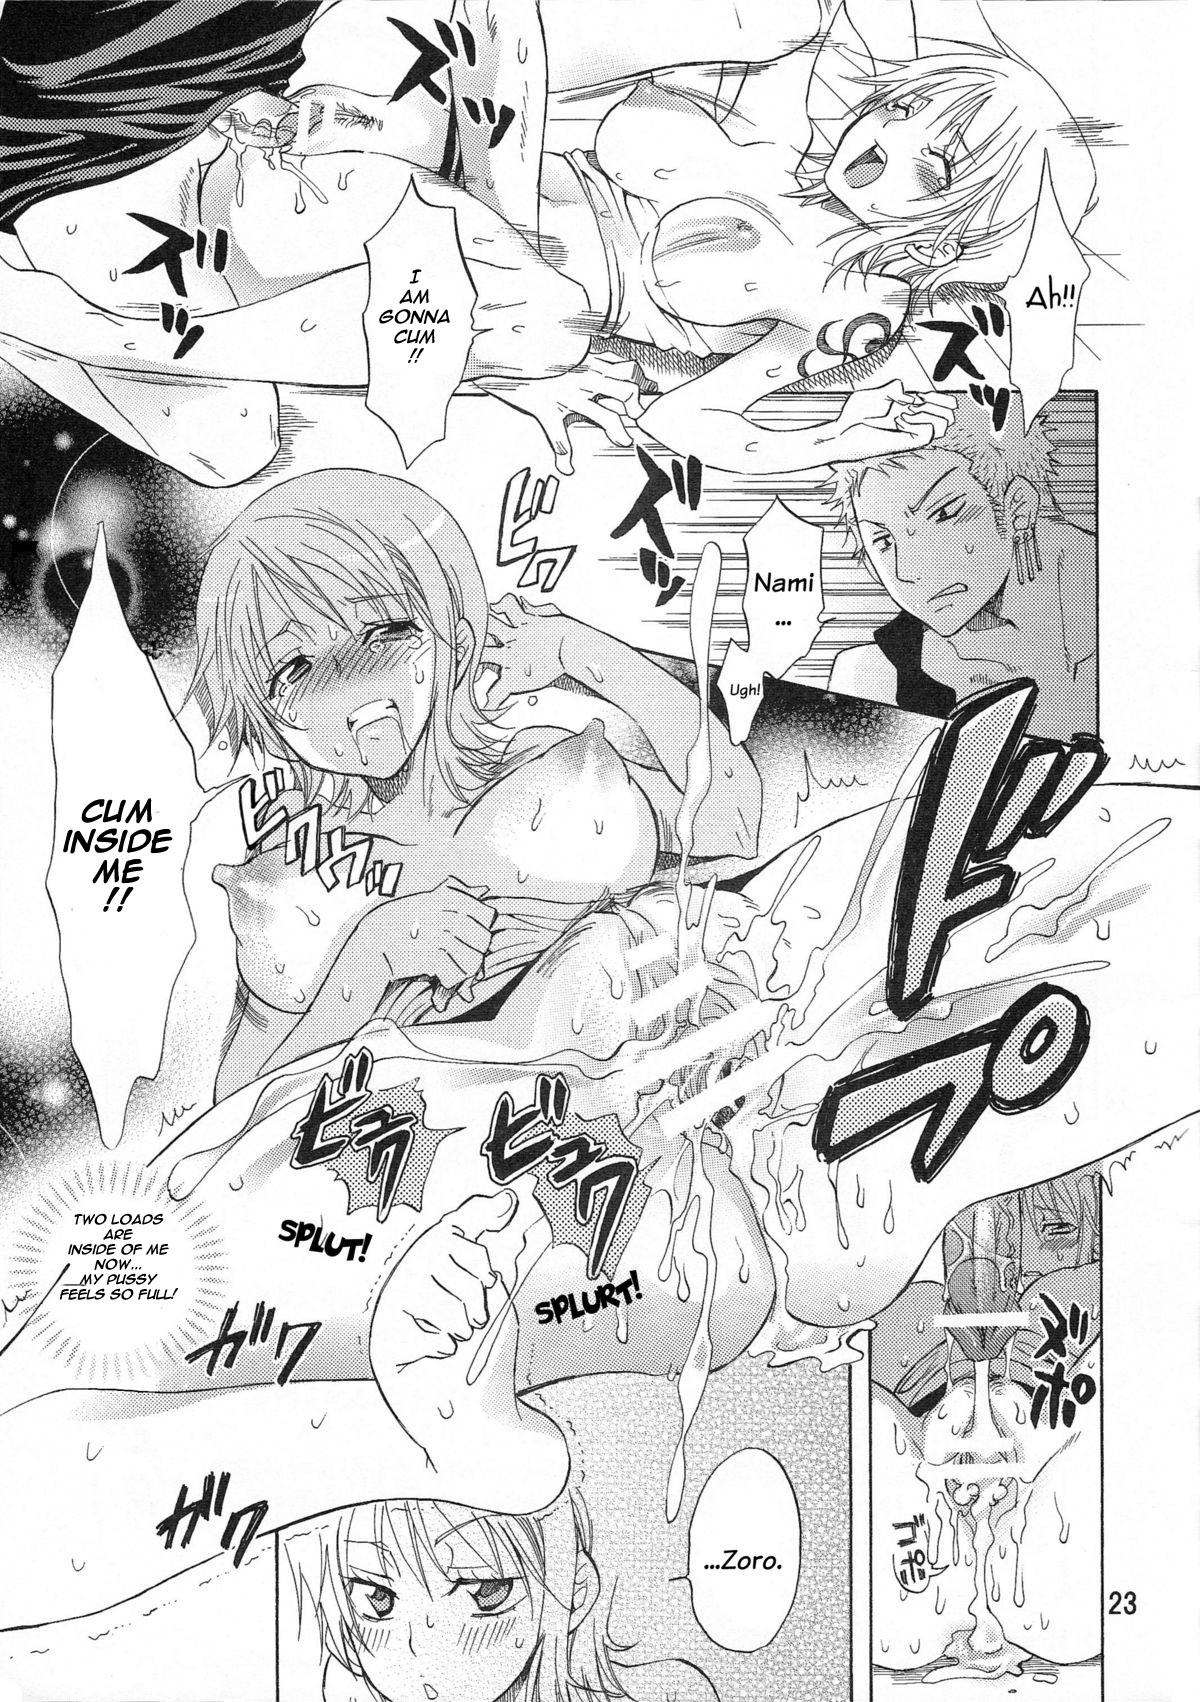 (C75) [Kurione-sha (YU-RI)] Nami-chan to A SO BO | Let's Play with Nami-chan! (One Piece) [English] [haai1717] 22